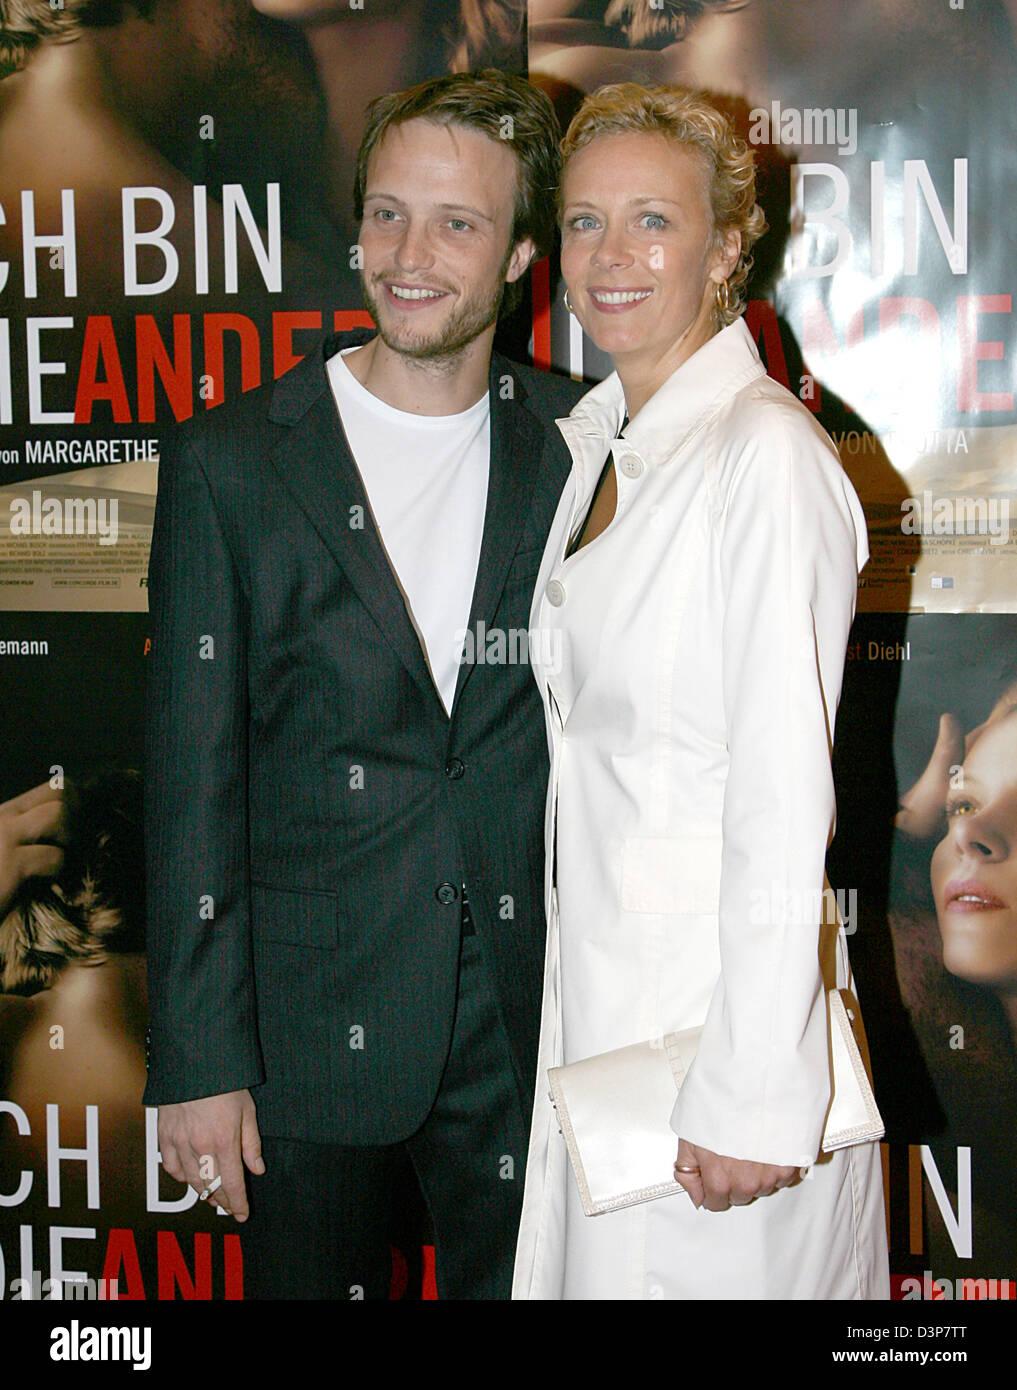 German actors August Diehl and Katja Riemann (R) appear for the film premiere 'Ich bin die Andere' in Munich, - Stock Image